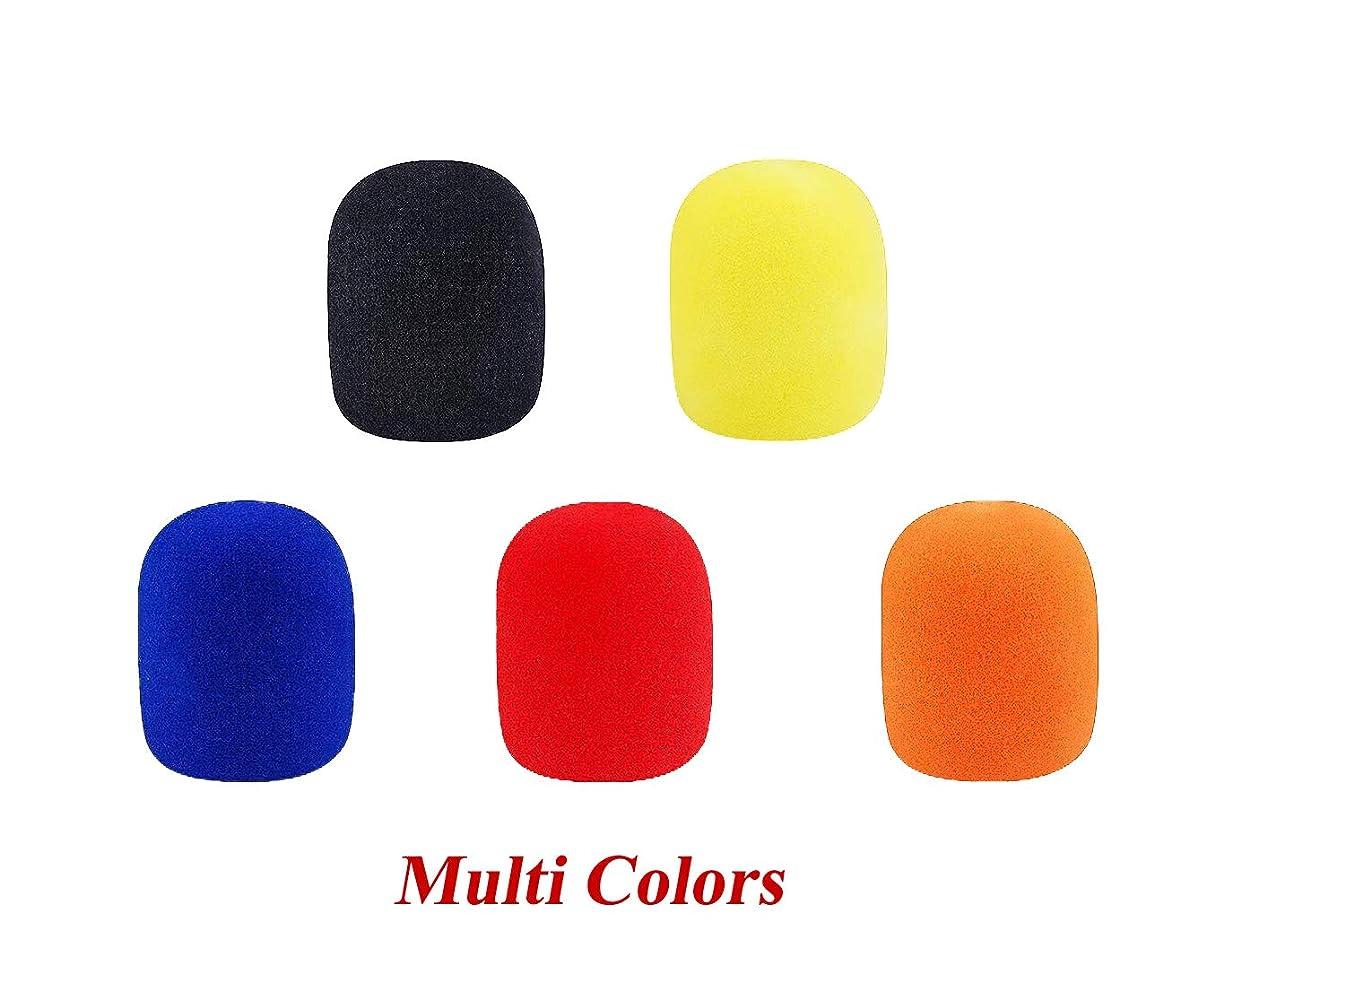 Foam Mic Cover Handheld Microphone Windscreen (MULTI COLORS)